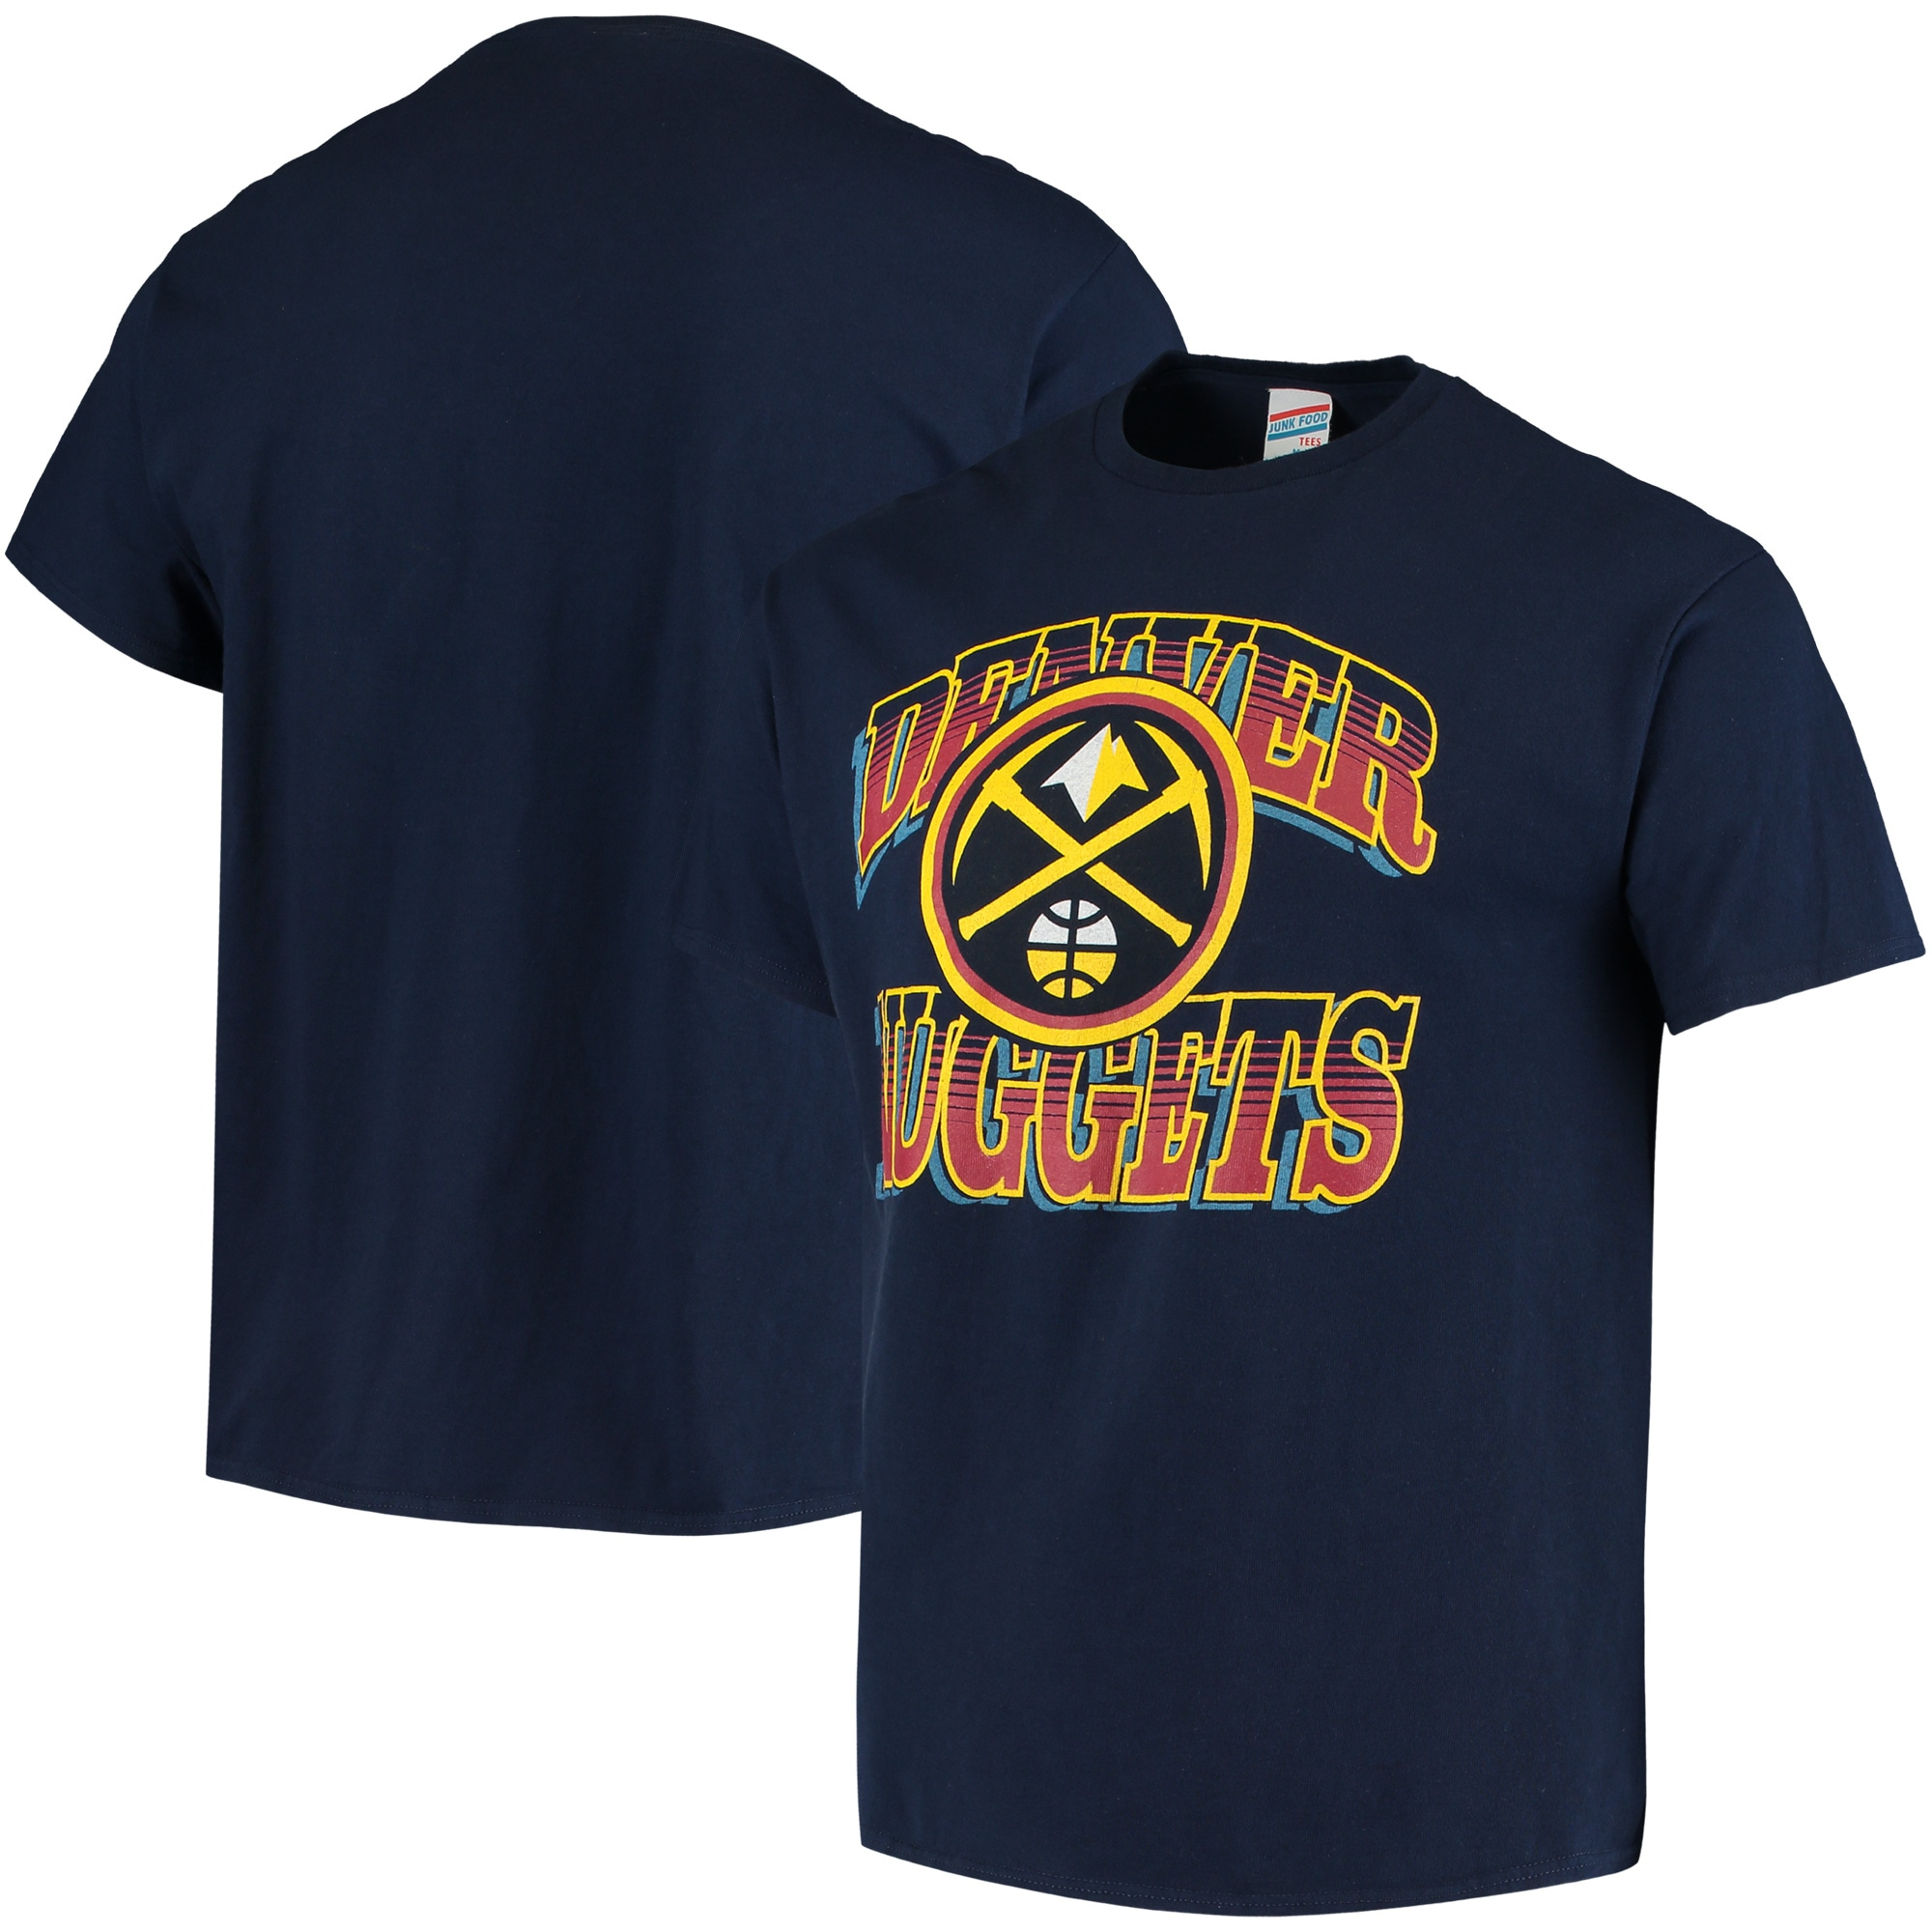 Denver Nuggets Junk Food Hometown T-Shirt - Navy